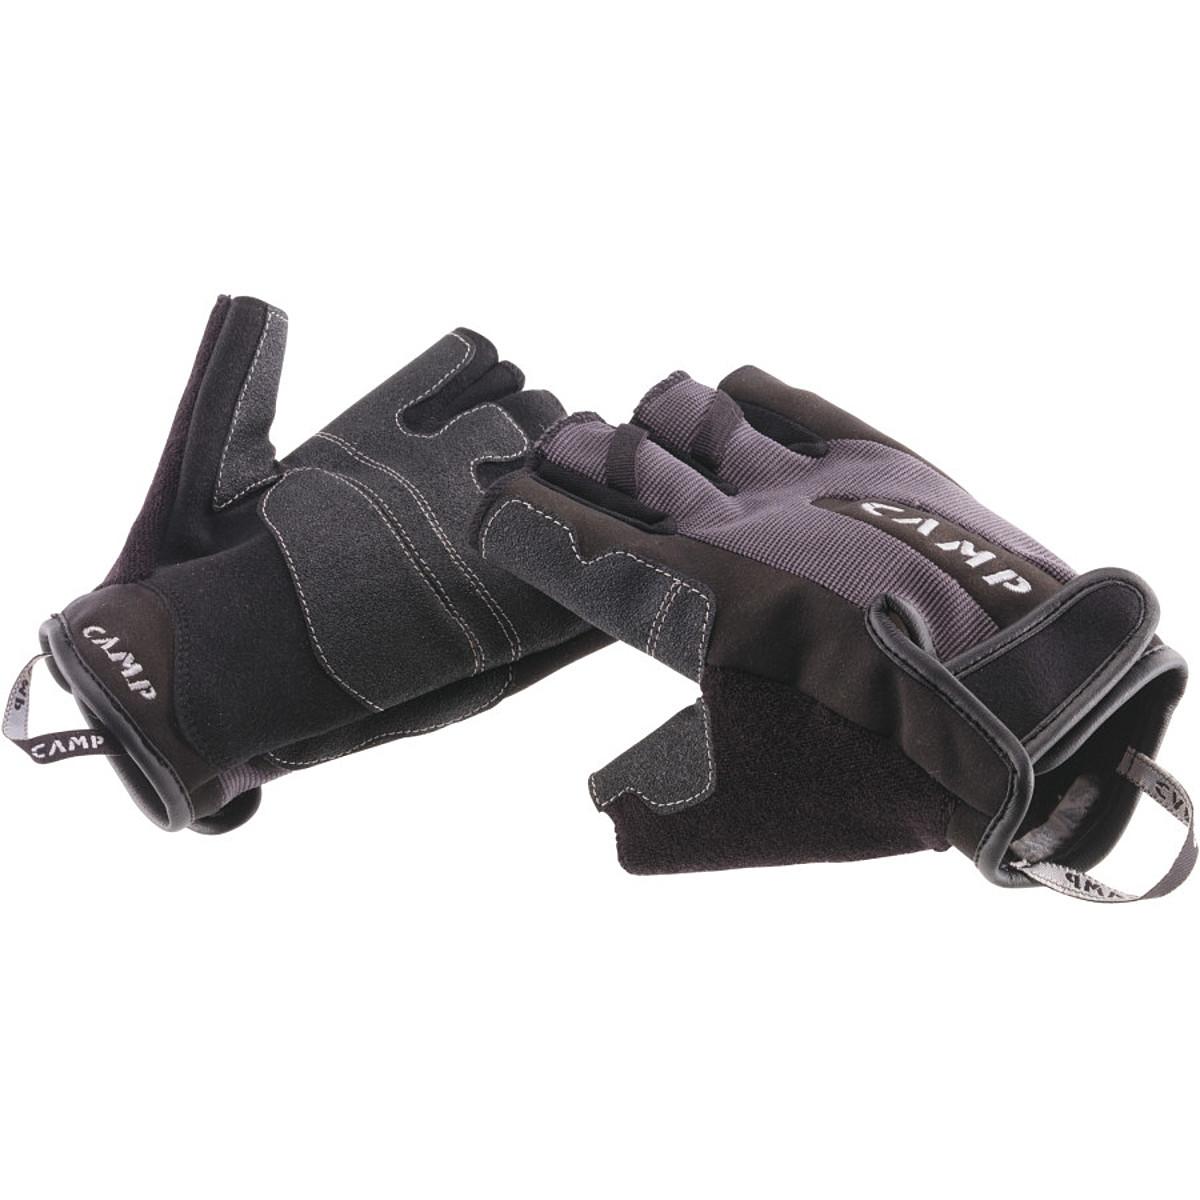 CAMP Comfort Belay Gloves